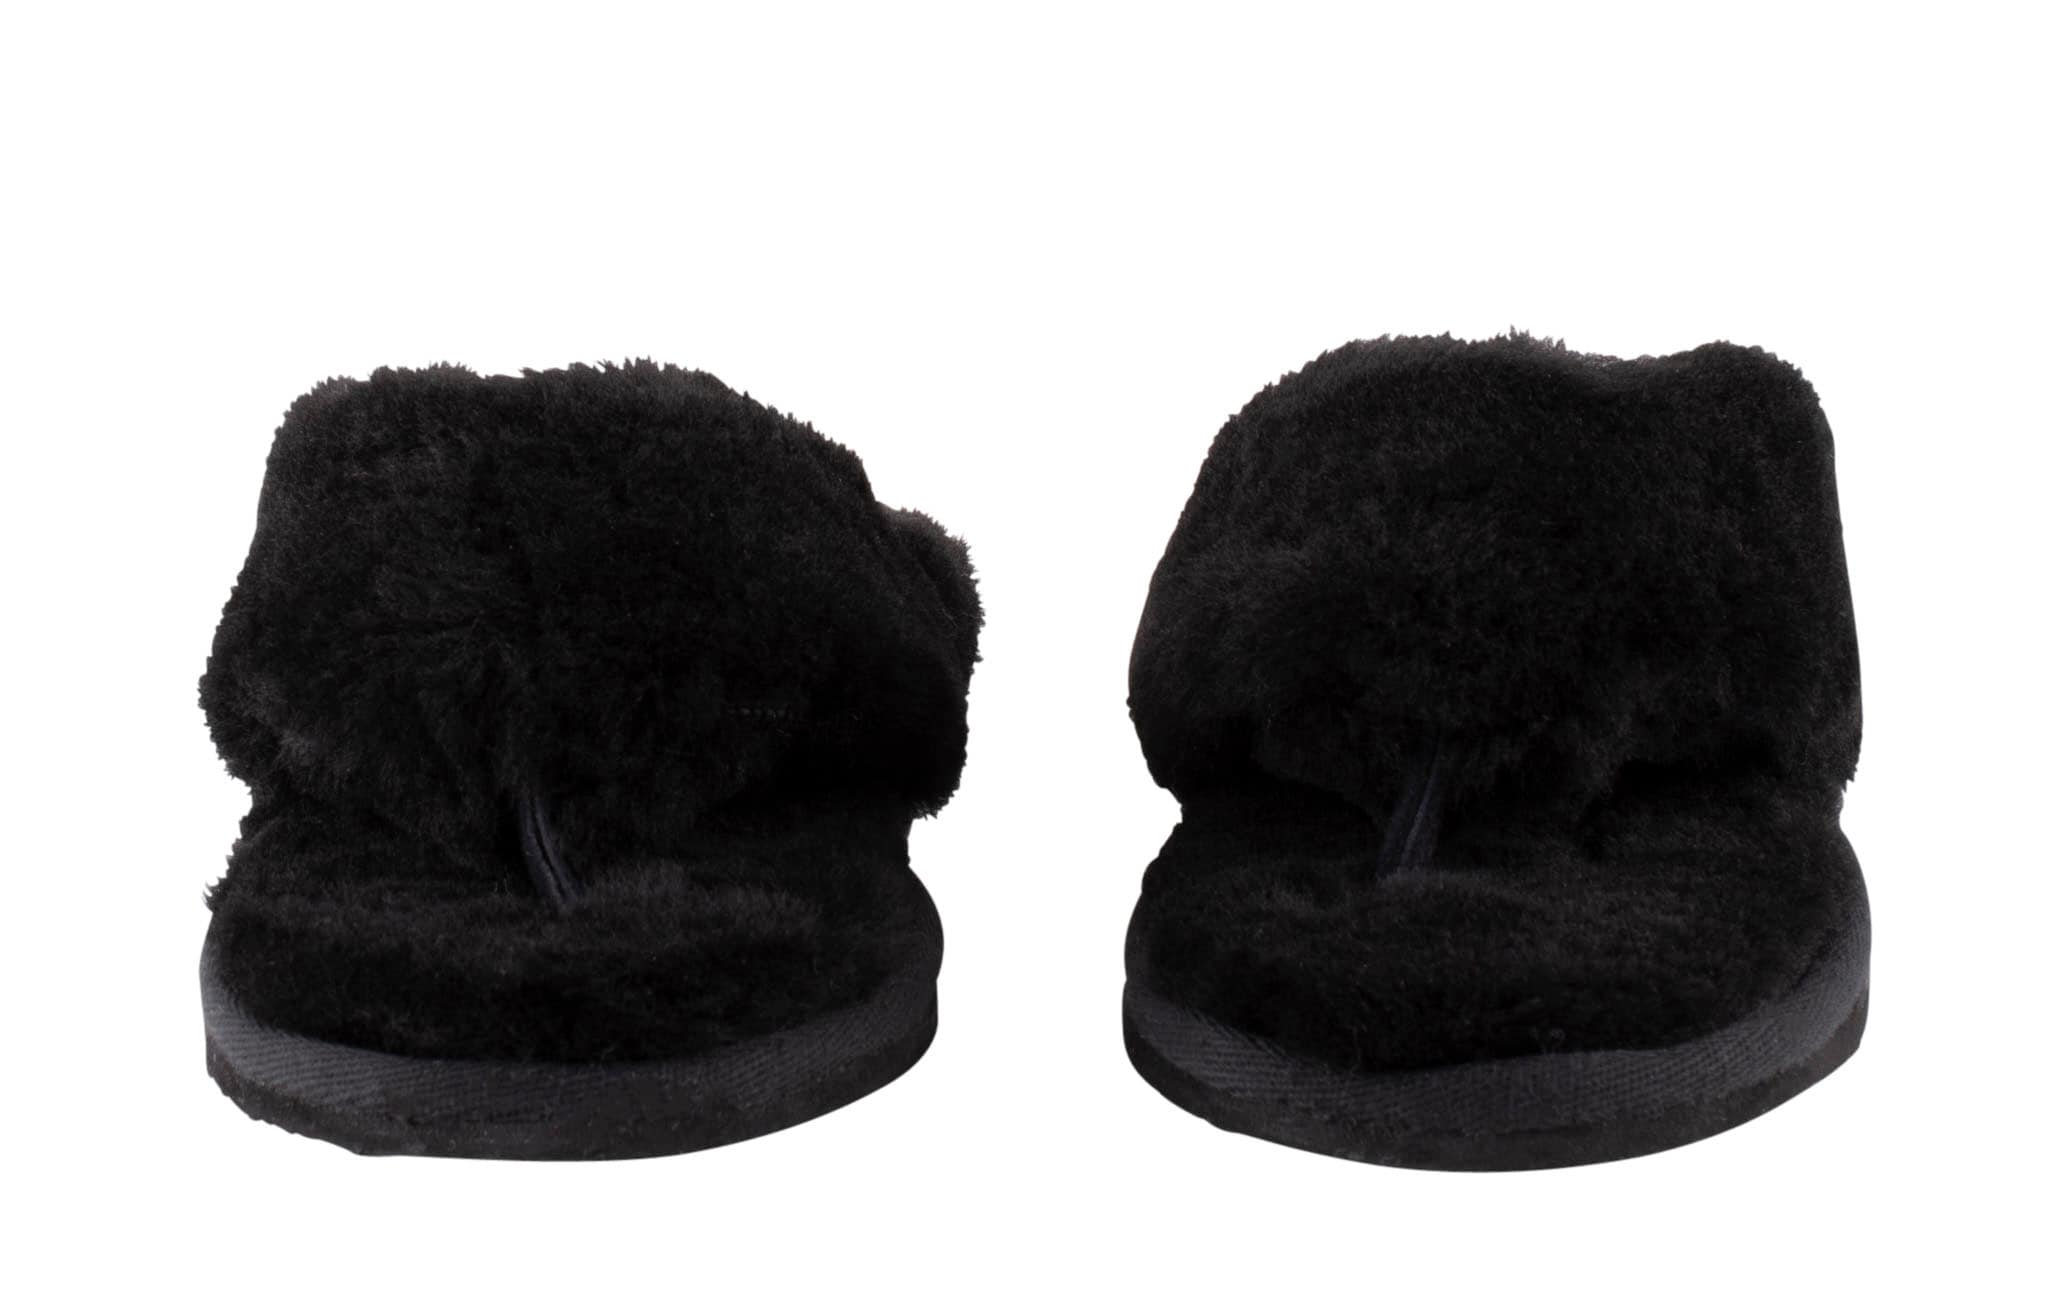 Shepherd Pernilla slippers